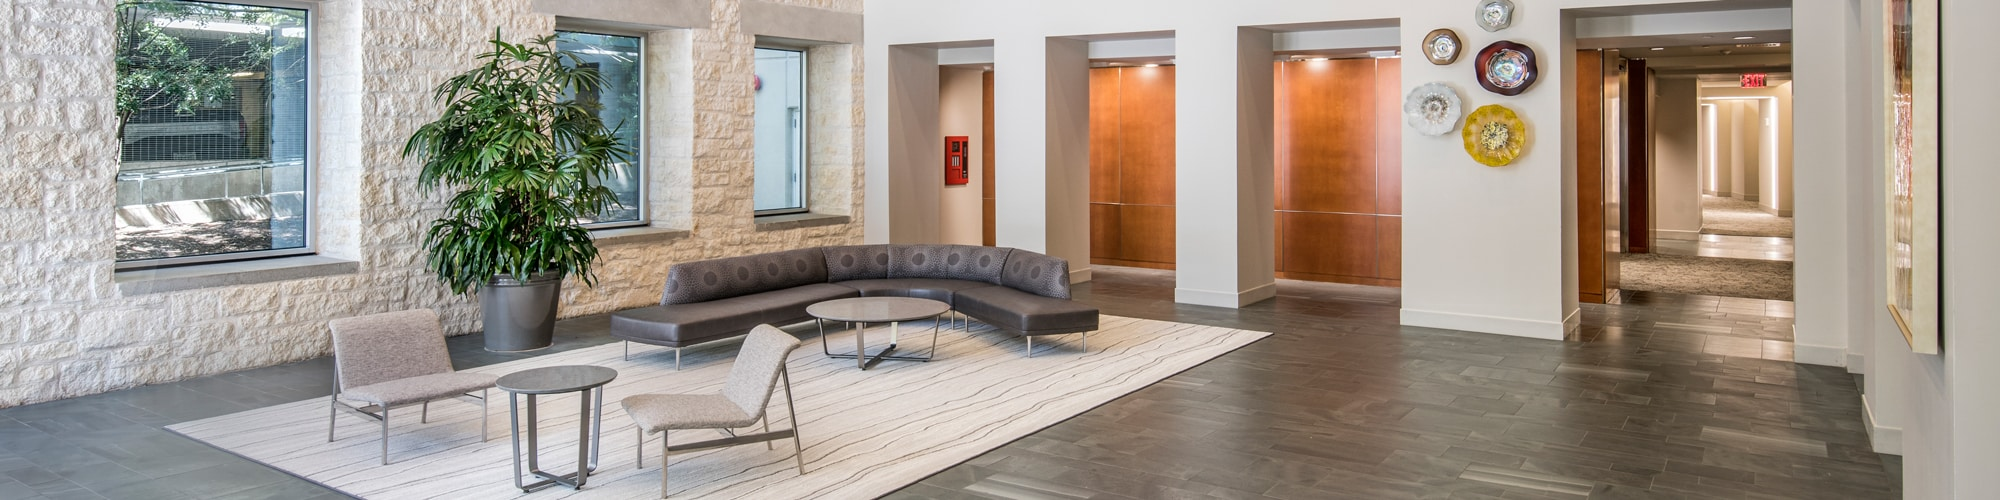 The Terrace Lobby | 2600 Via Fortuna Drive in Austin, Texas